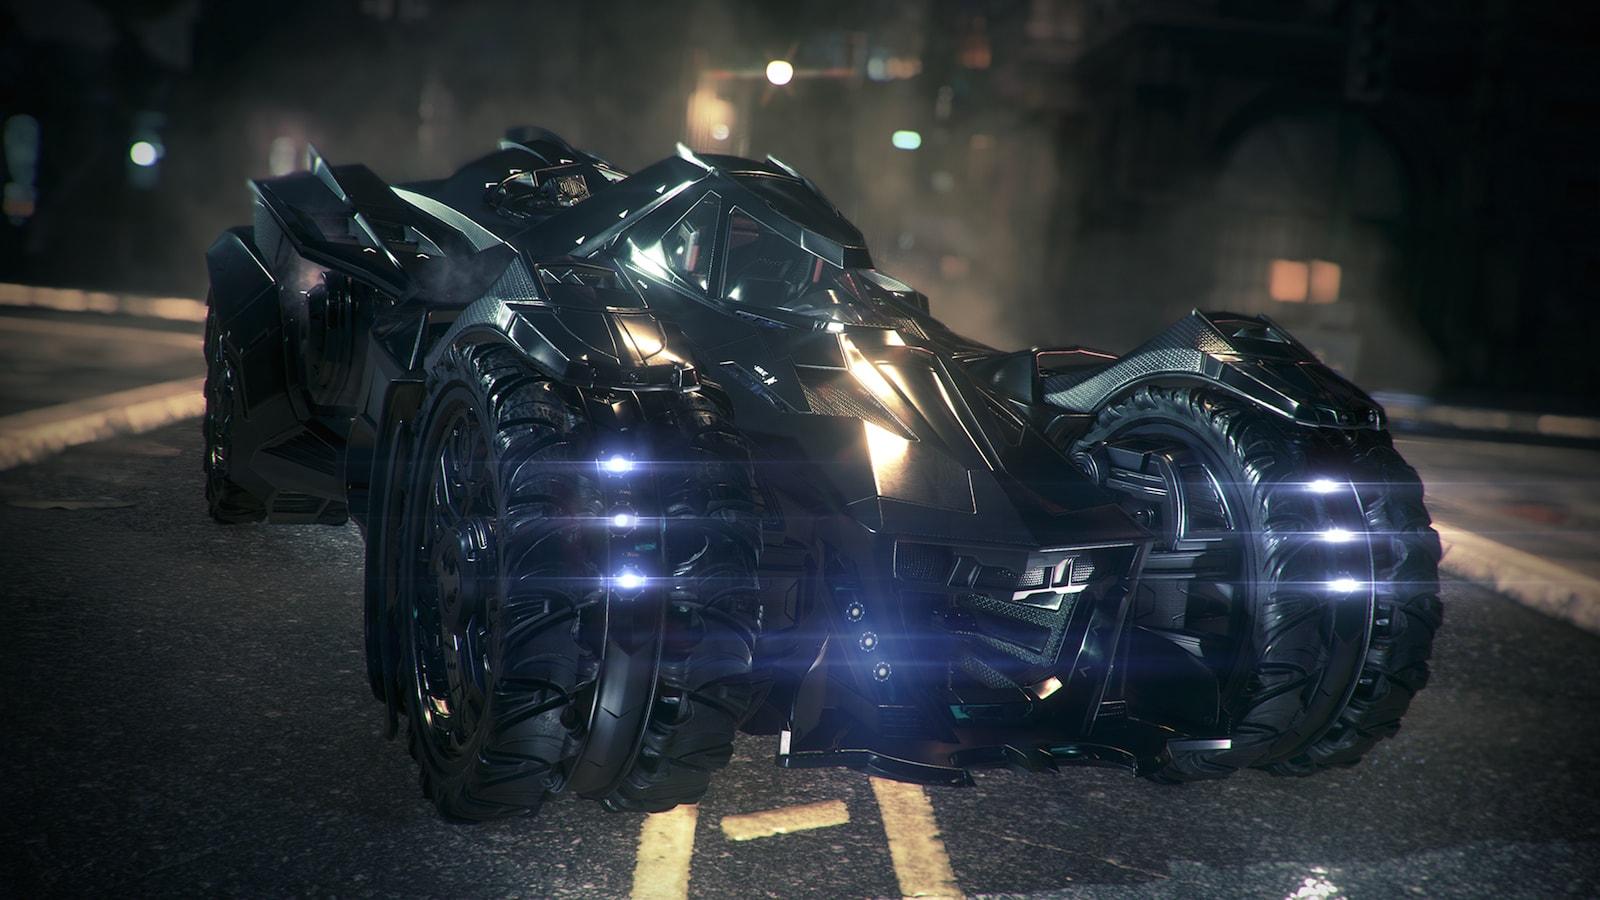 Batmobile from Batman Arkham Knight